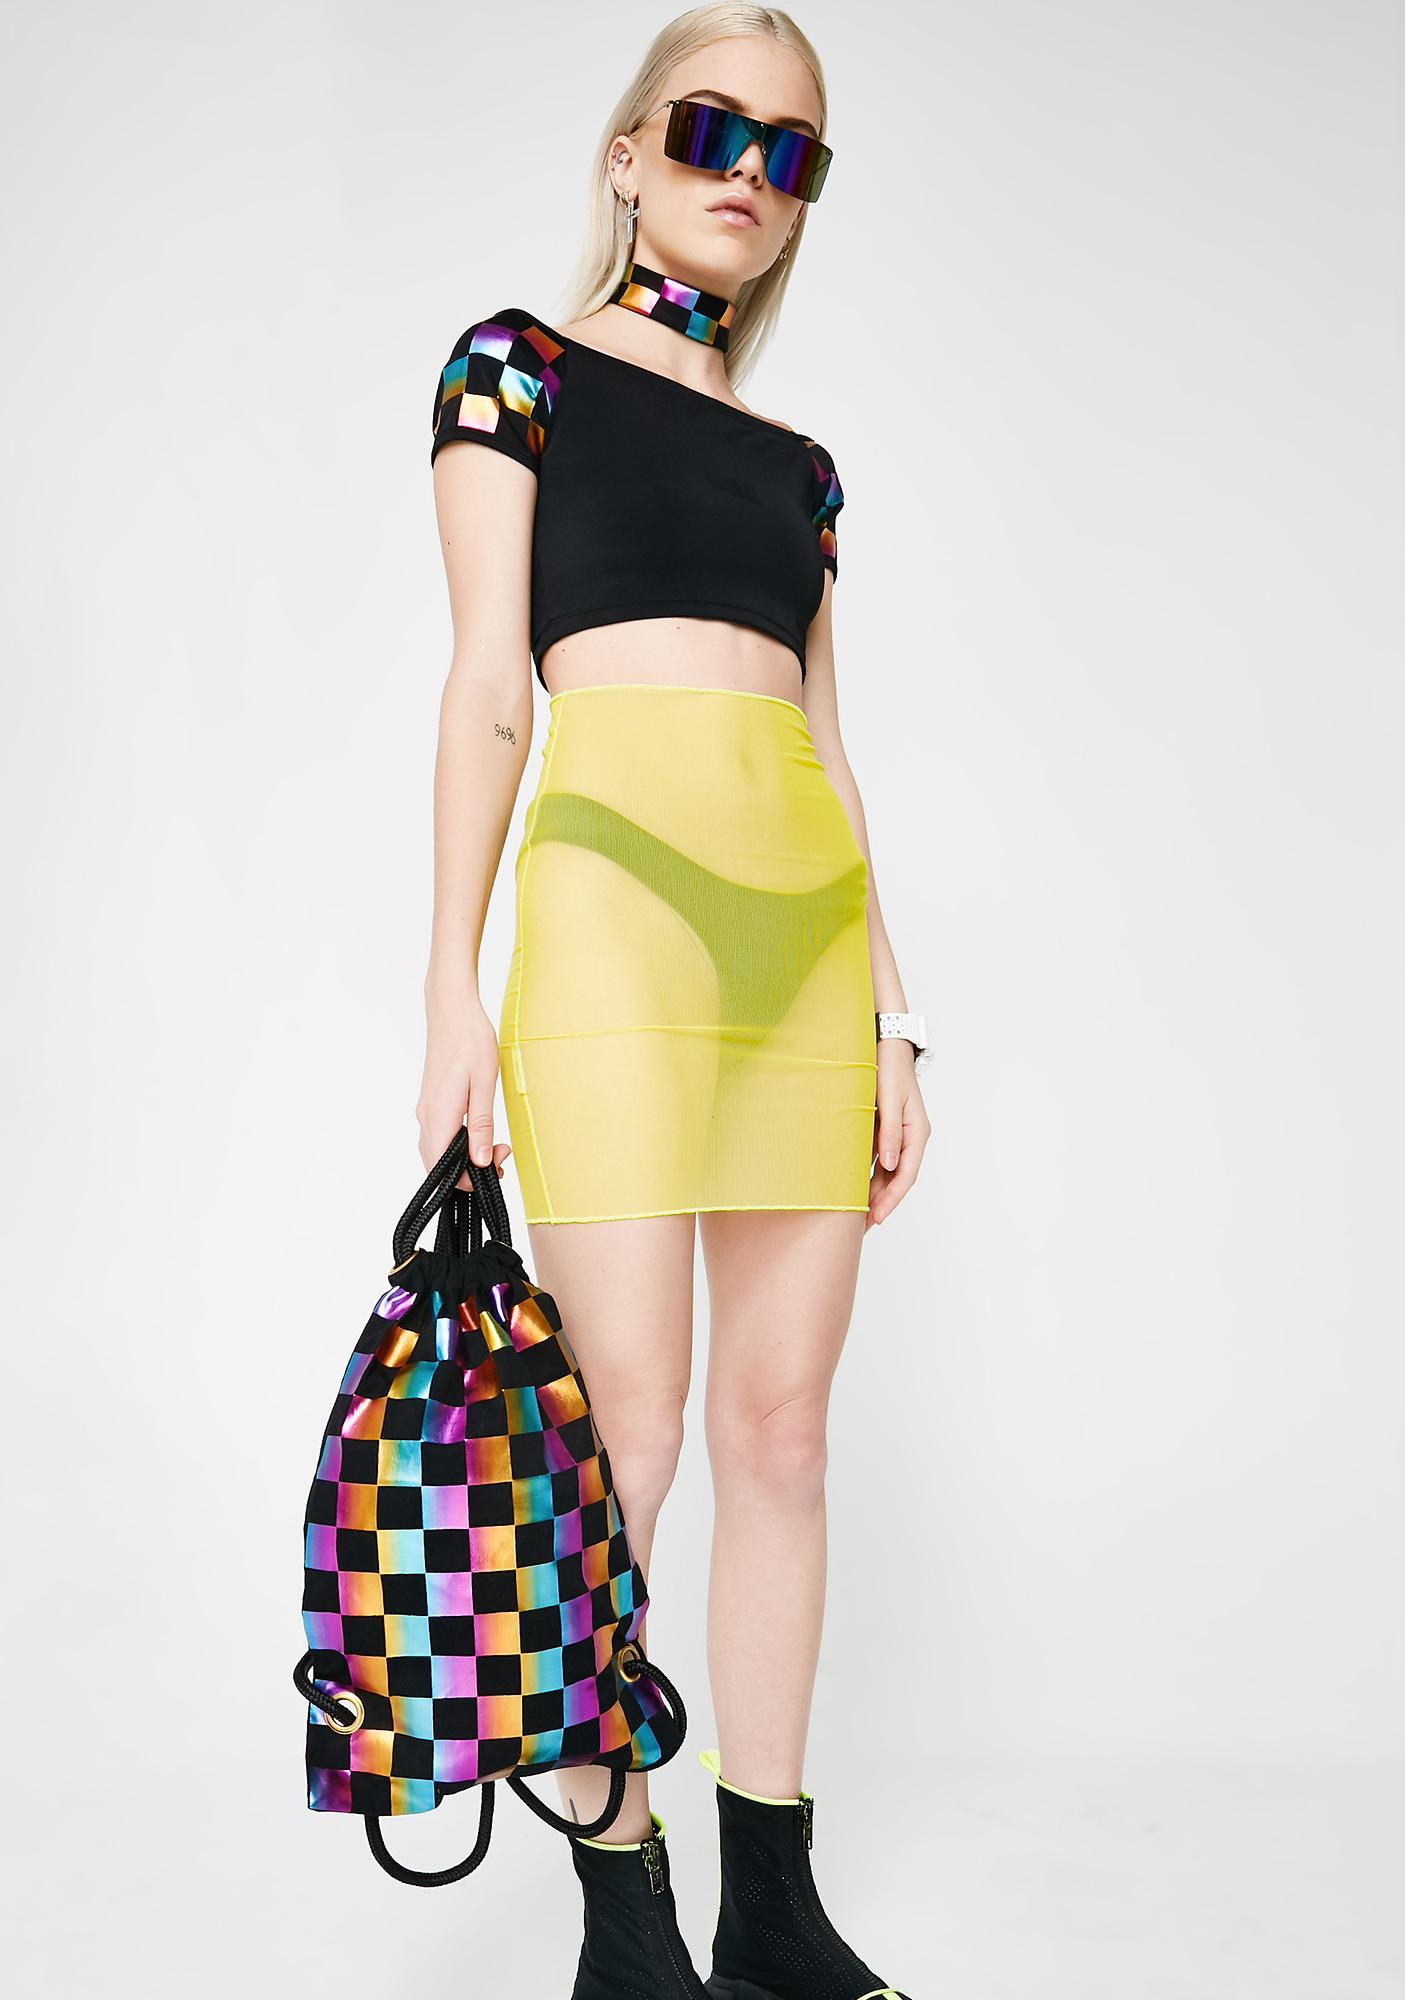 Rainbow Rides Drawstring Bag